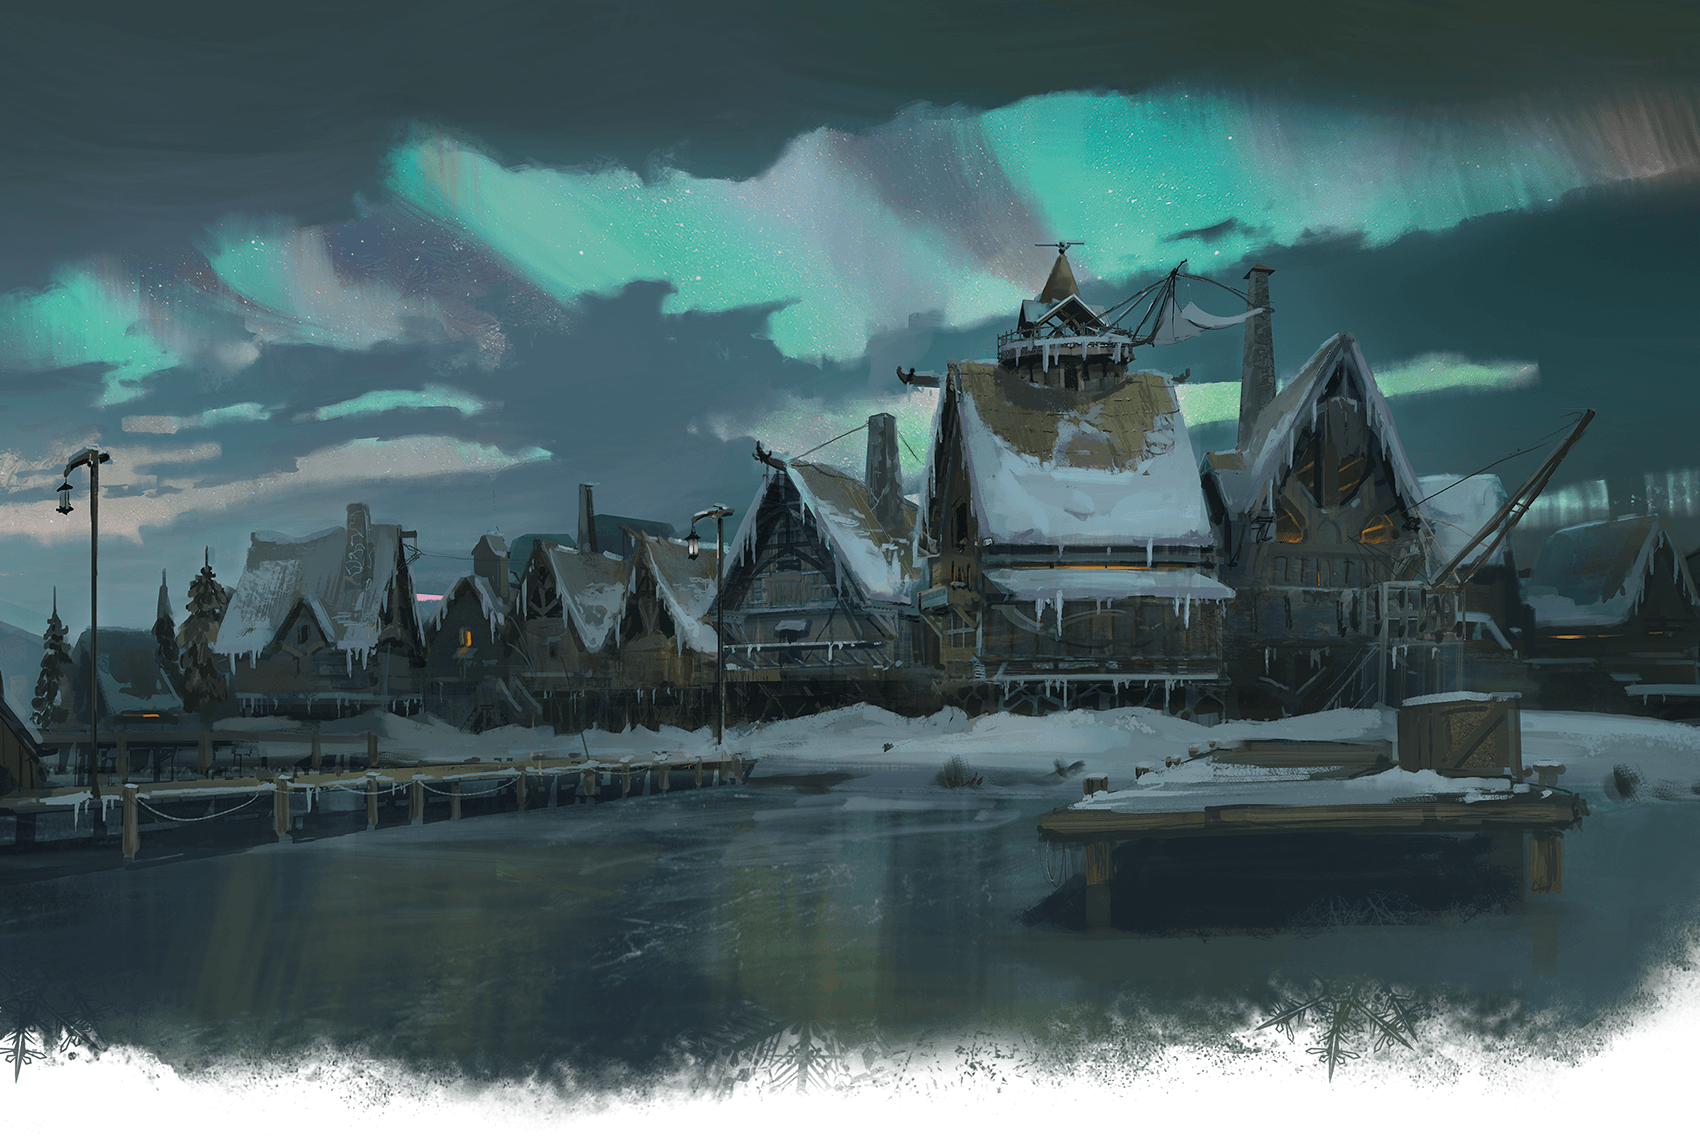 A rustic town forzen in ice.